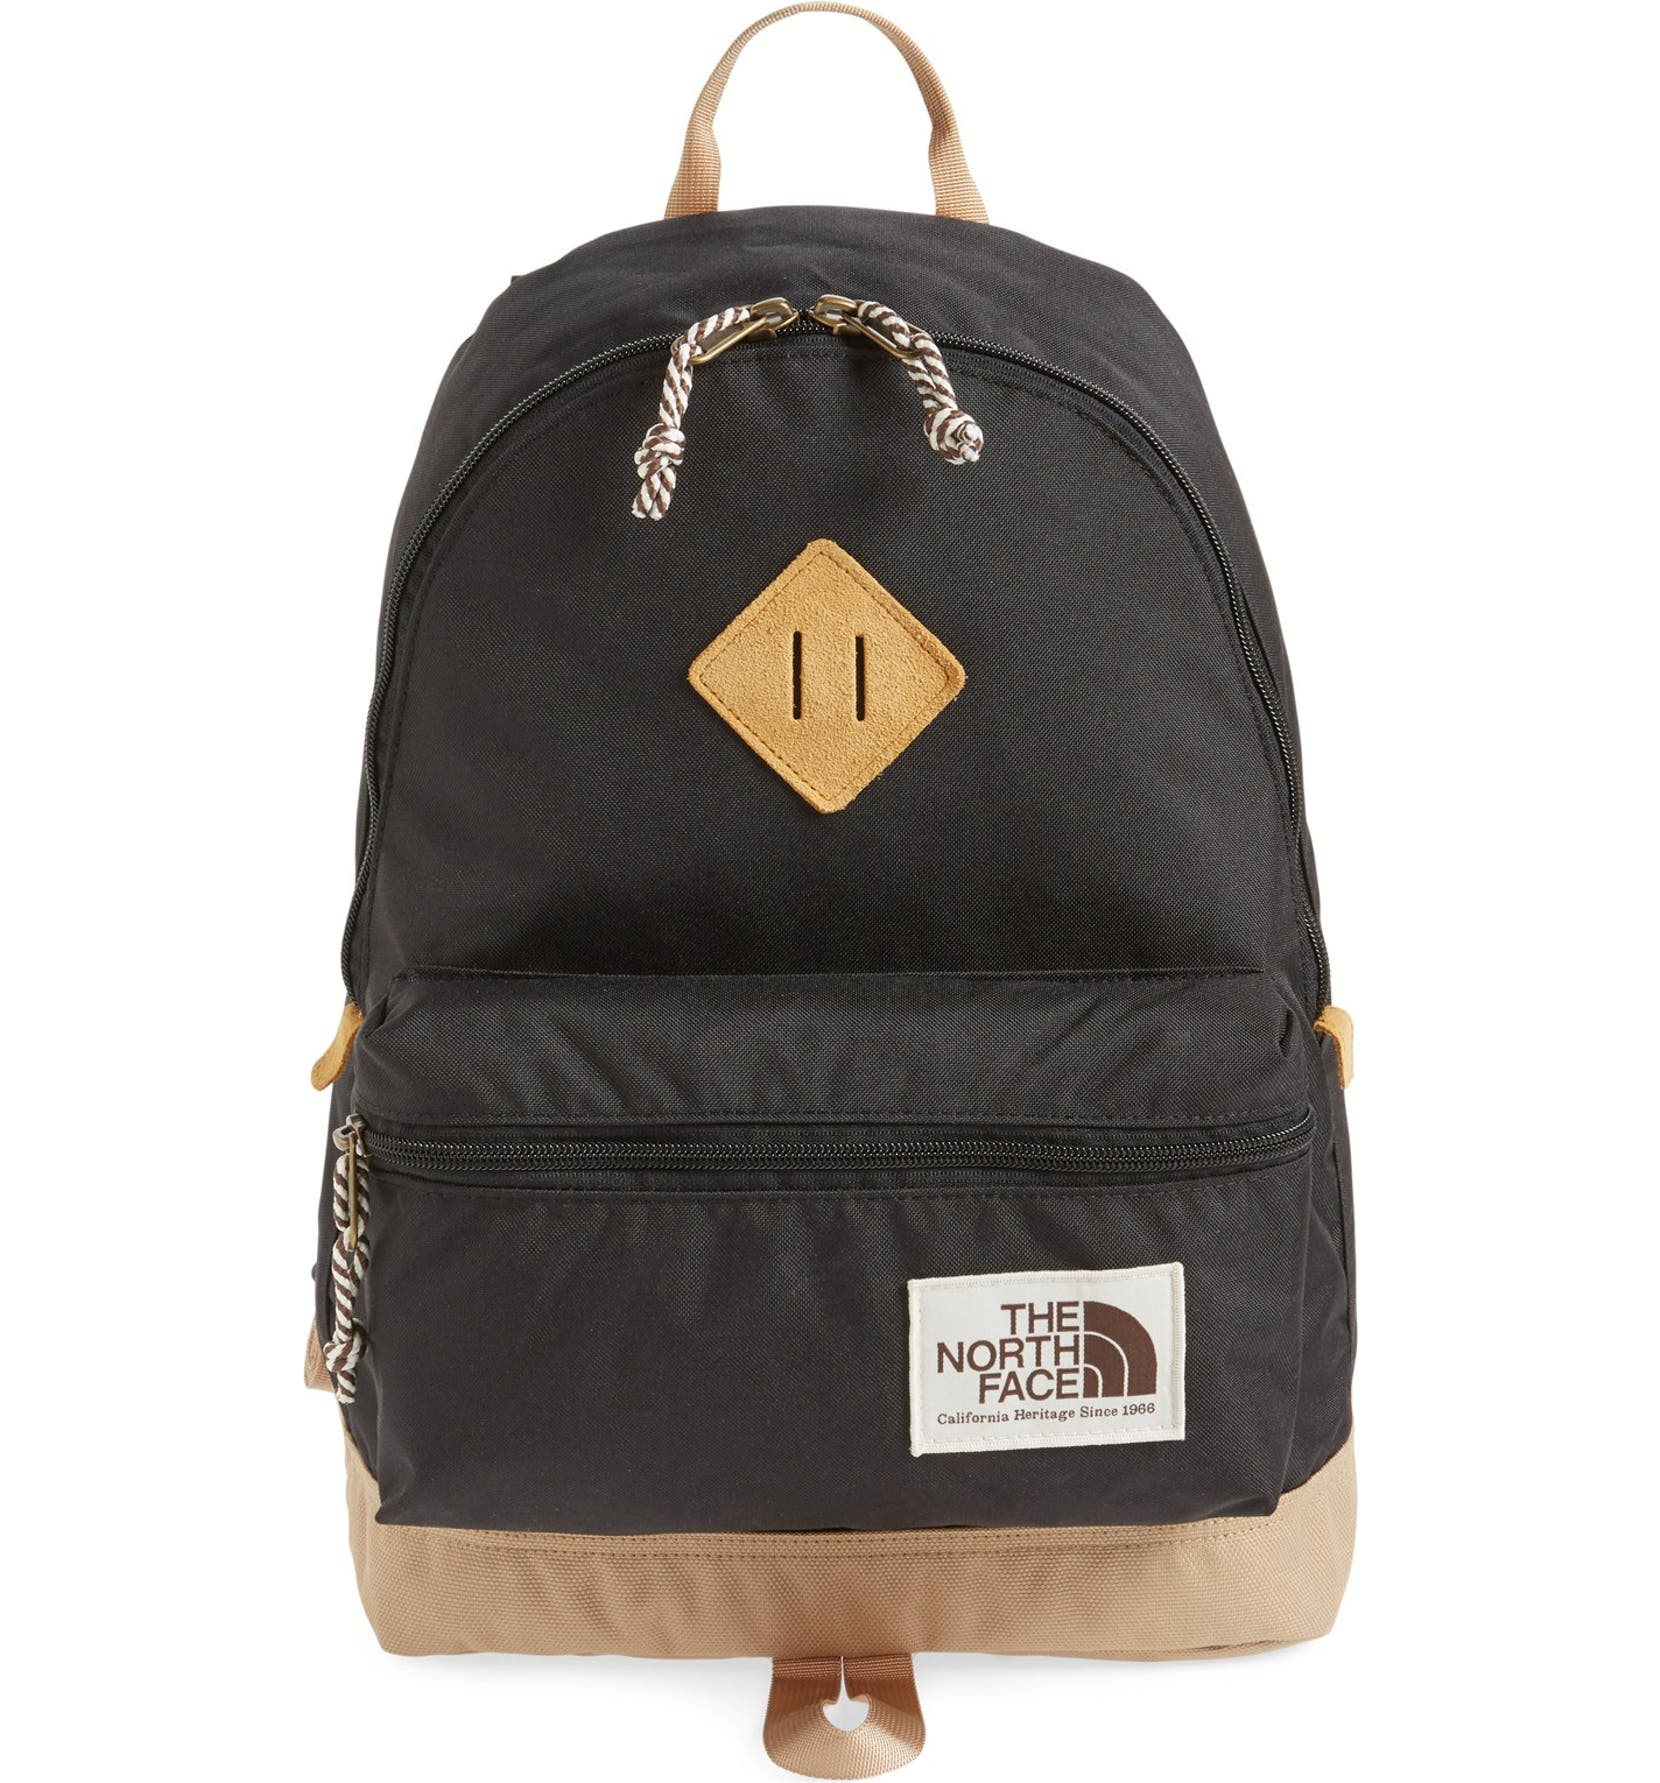 47ac43dd13 The North Face  Mini Berkeley  Backpack (Kids)